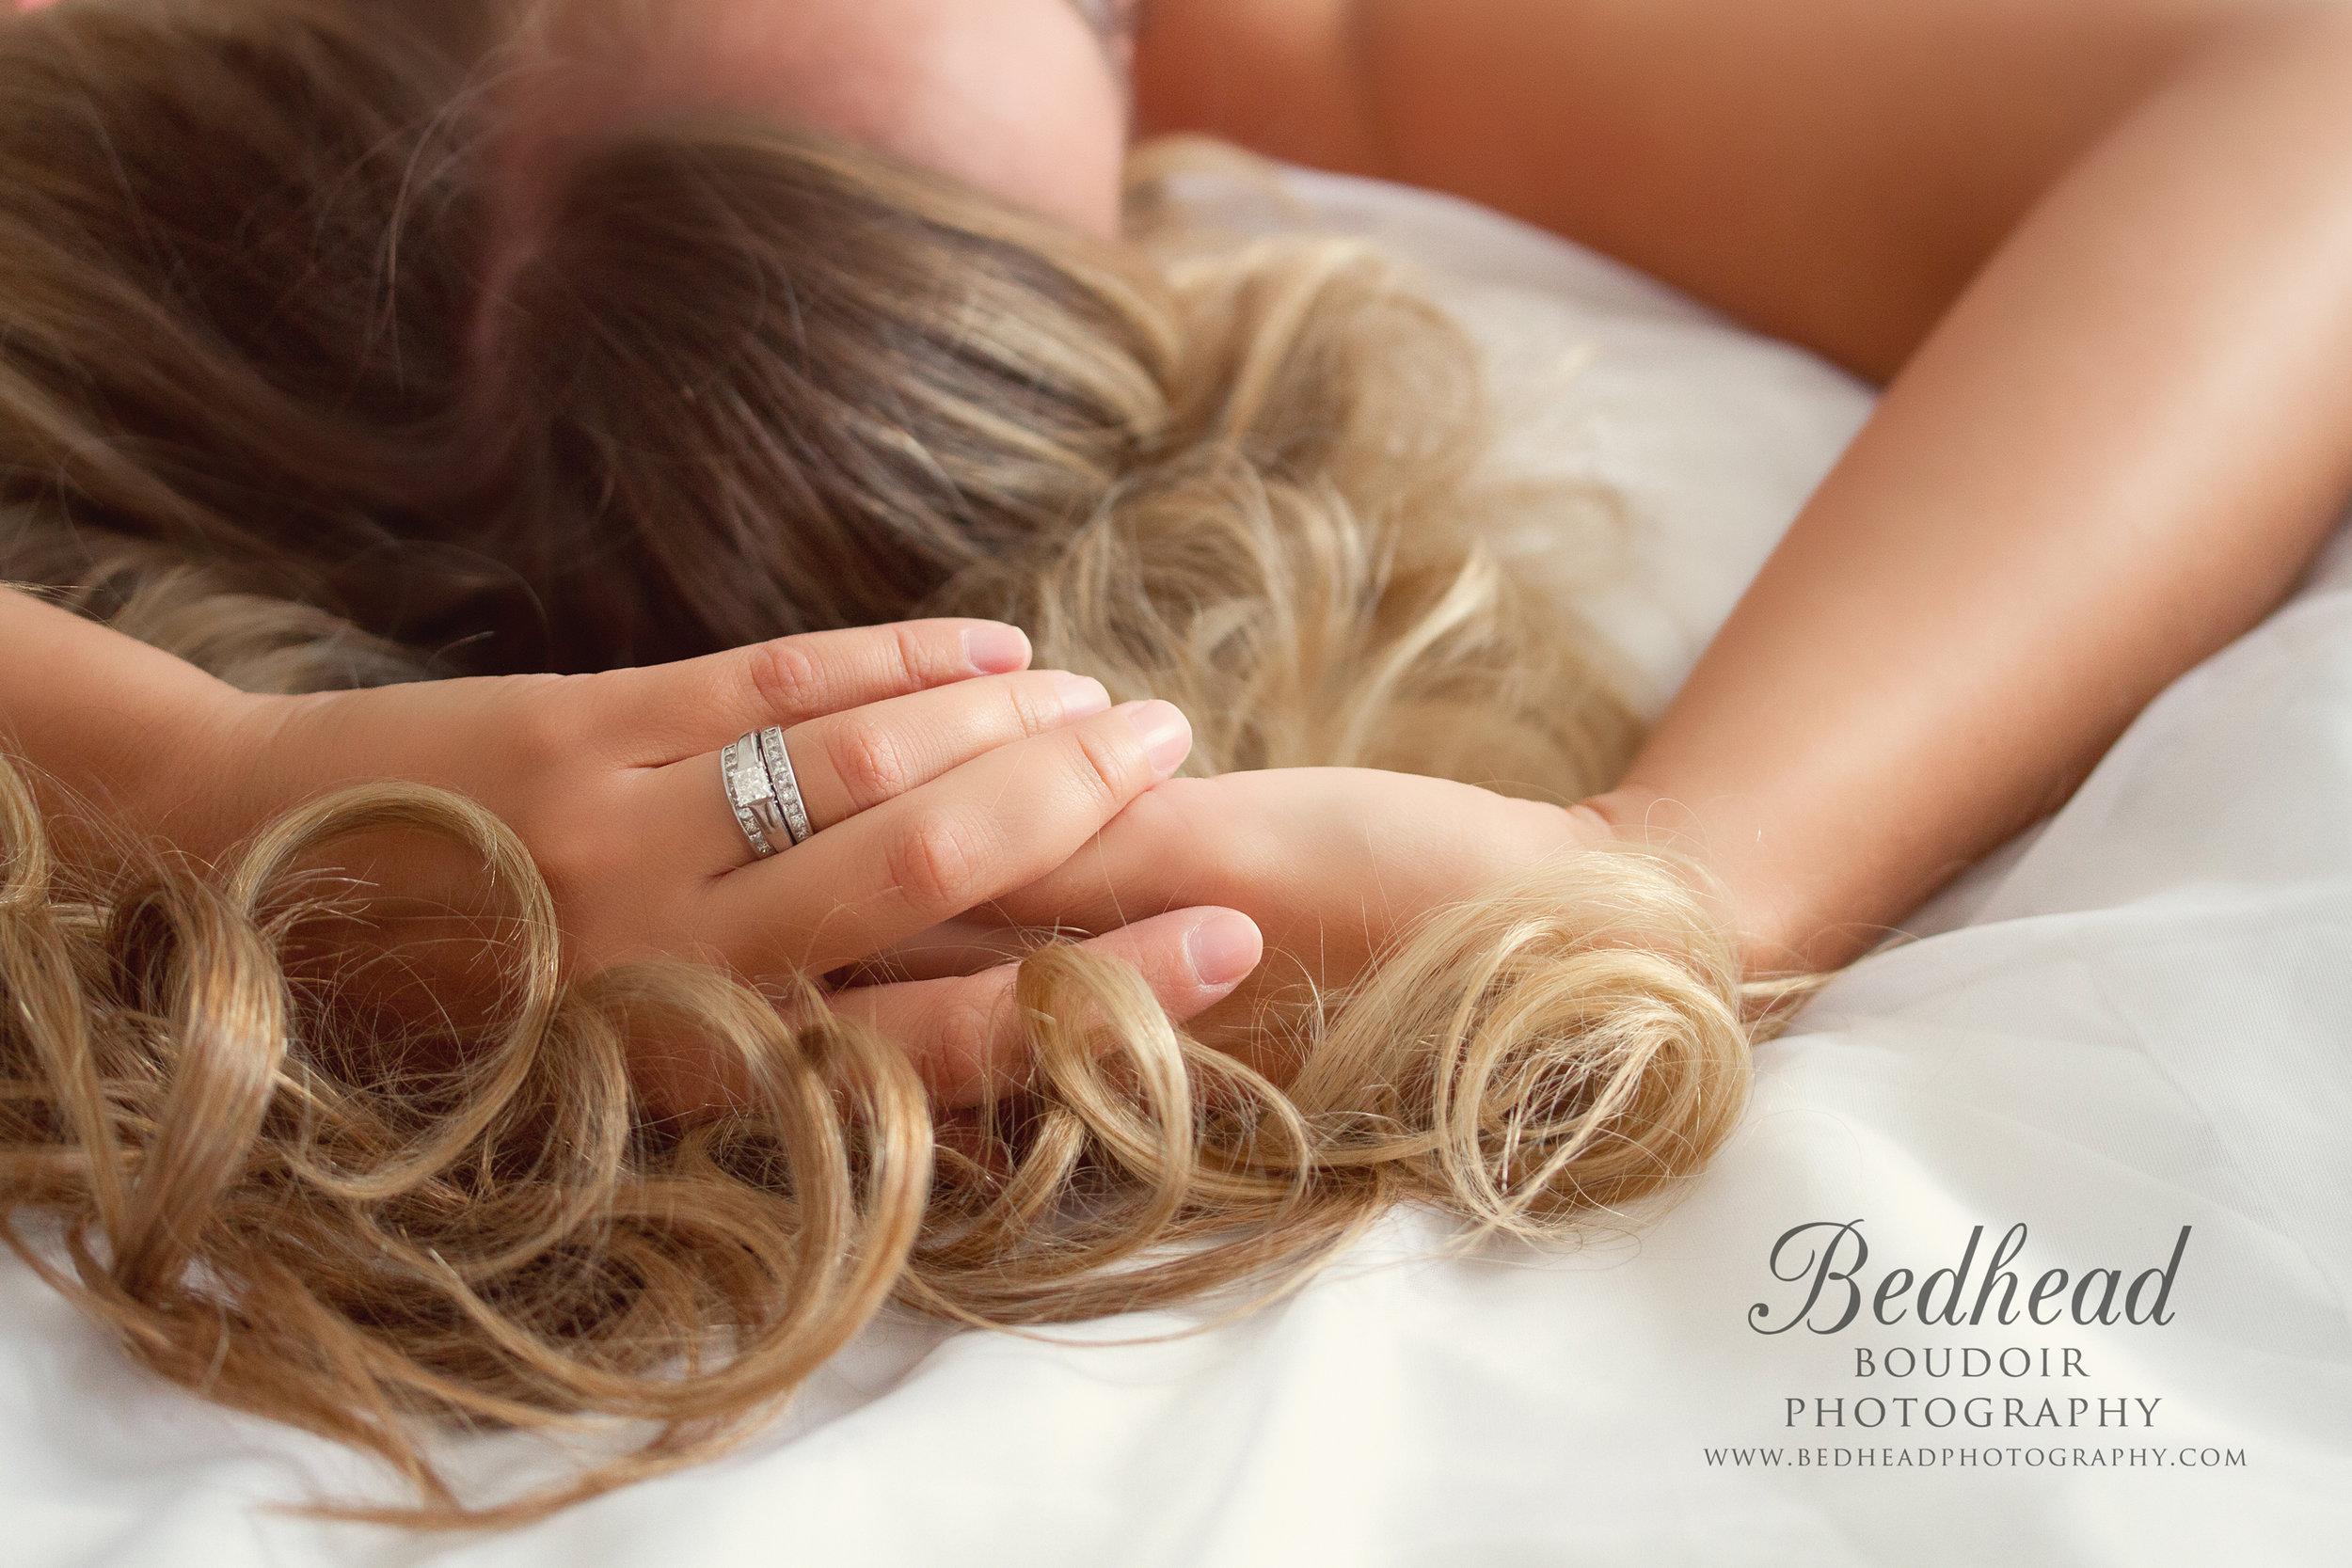 bedhead boudoir photography client shoot